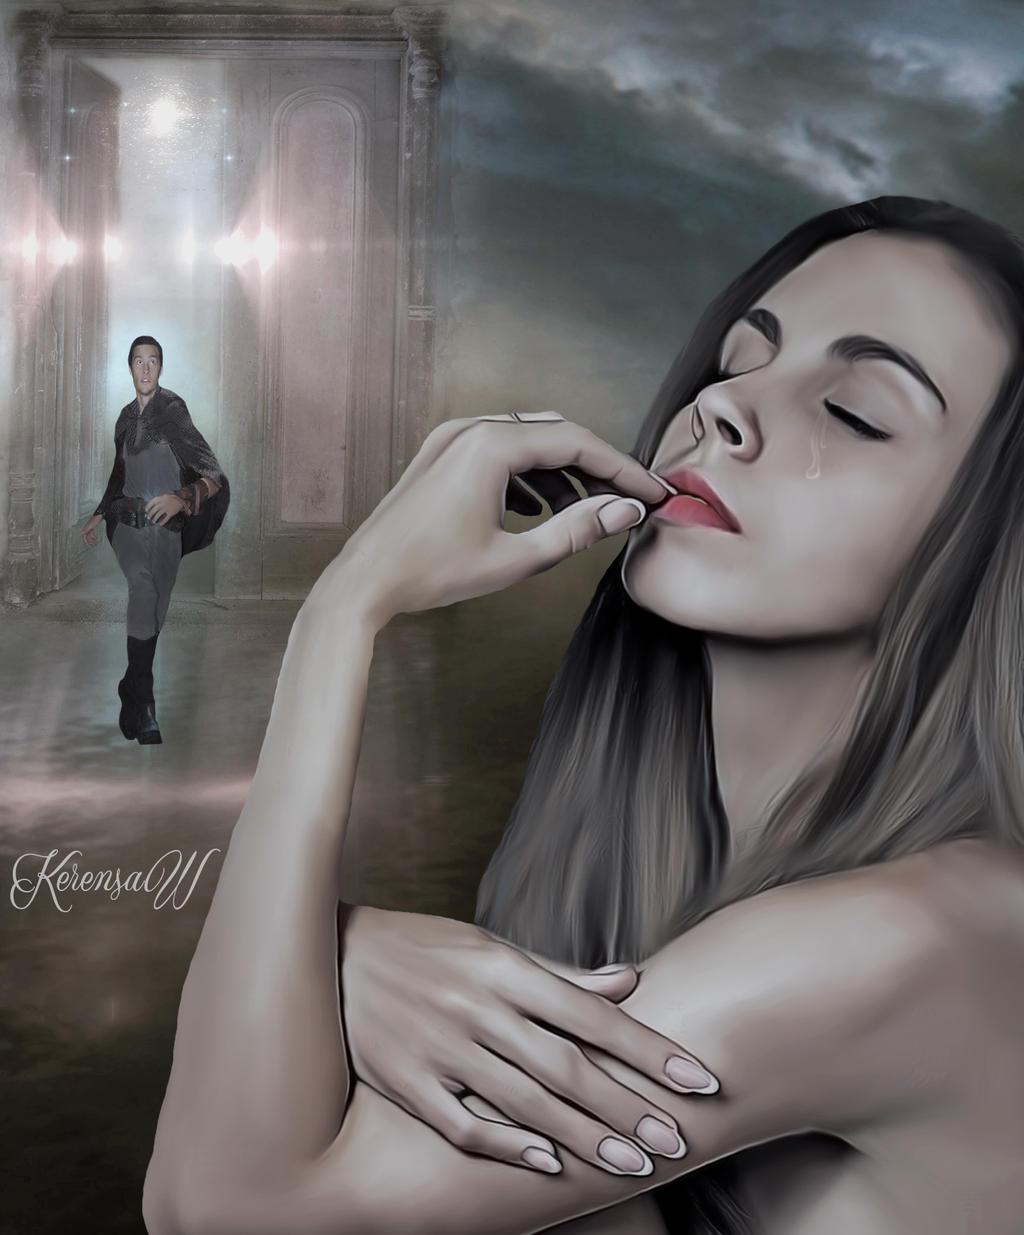 IN MY DREAMS by KerensaW